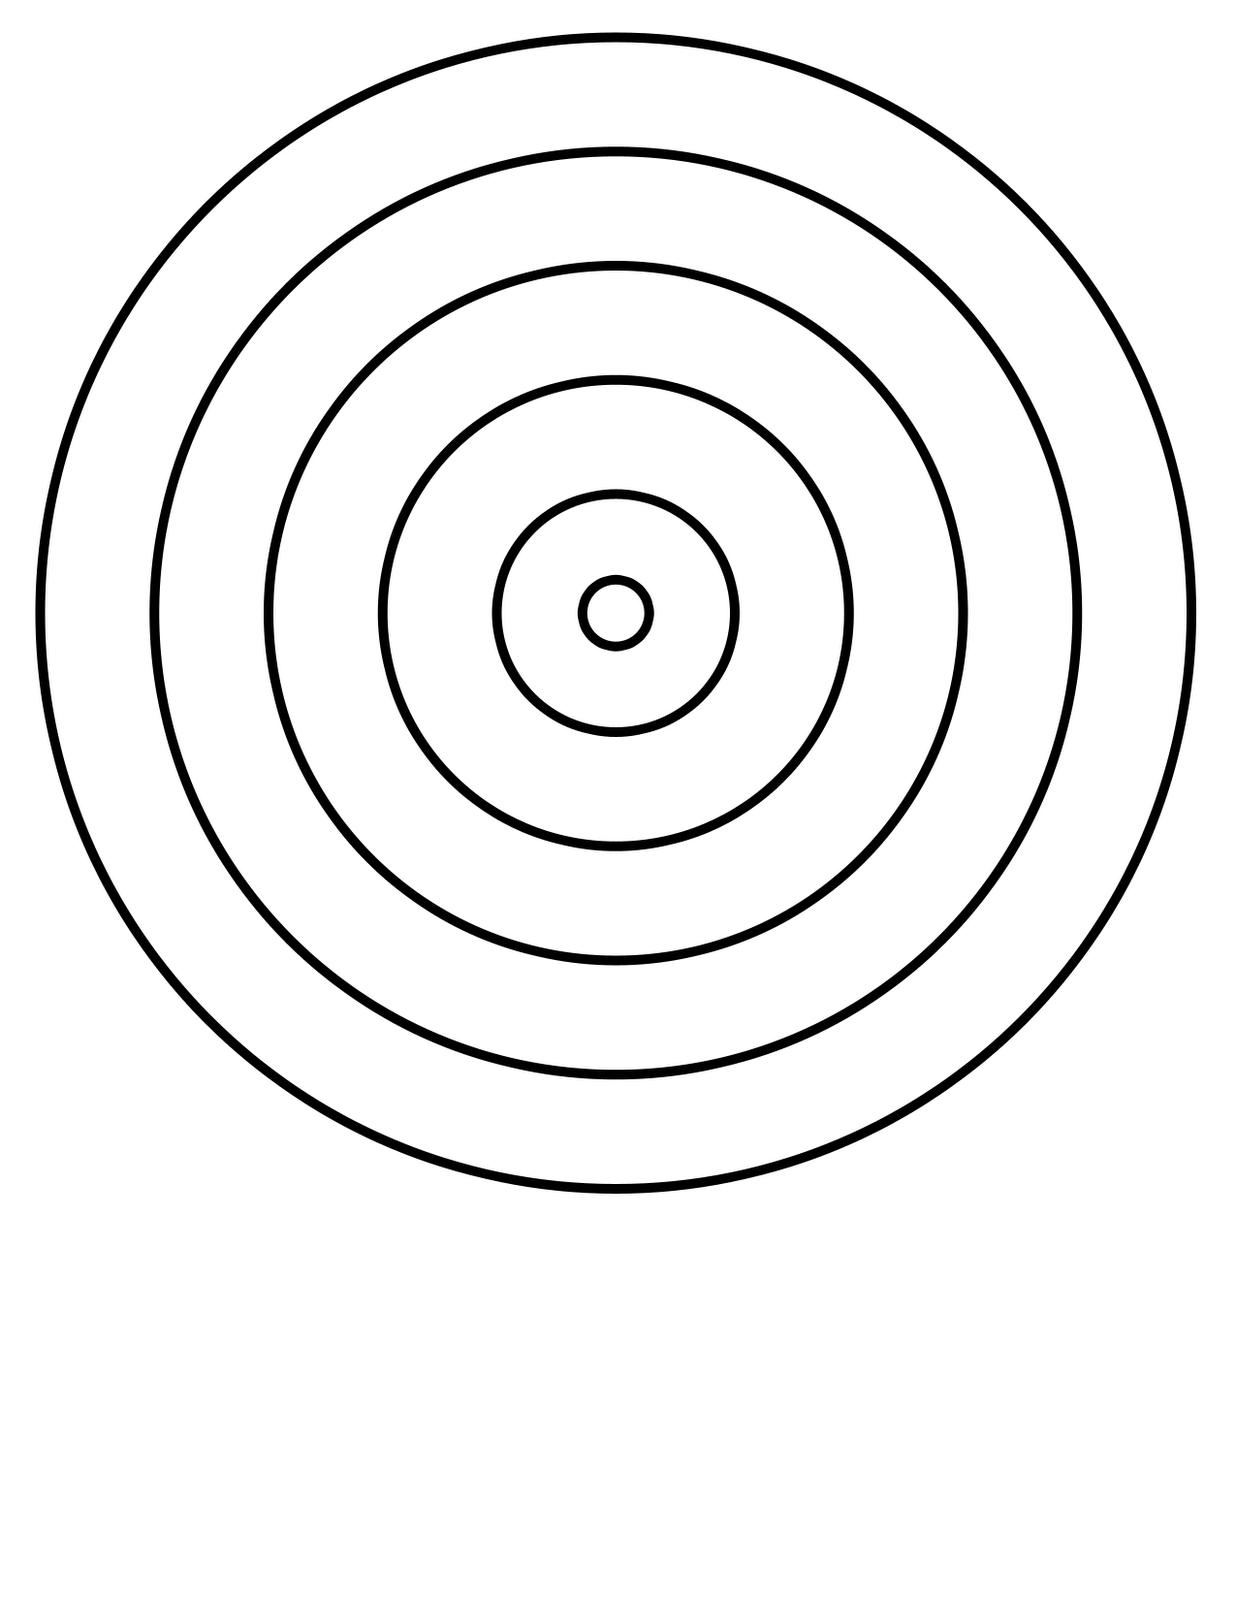 bullseye template printable - famous bullseye target